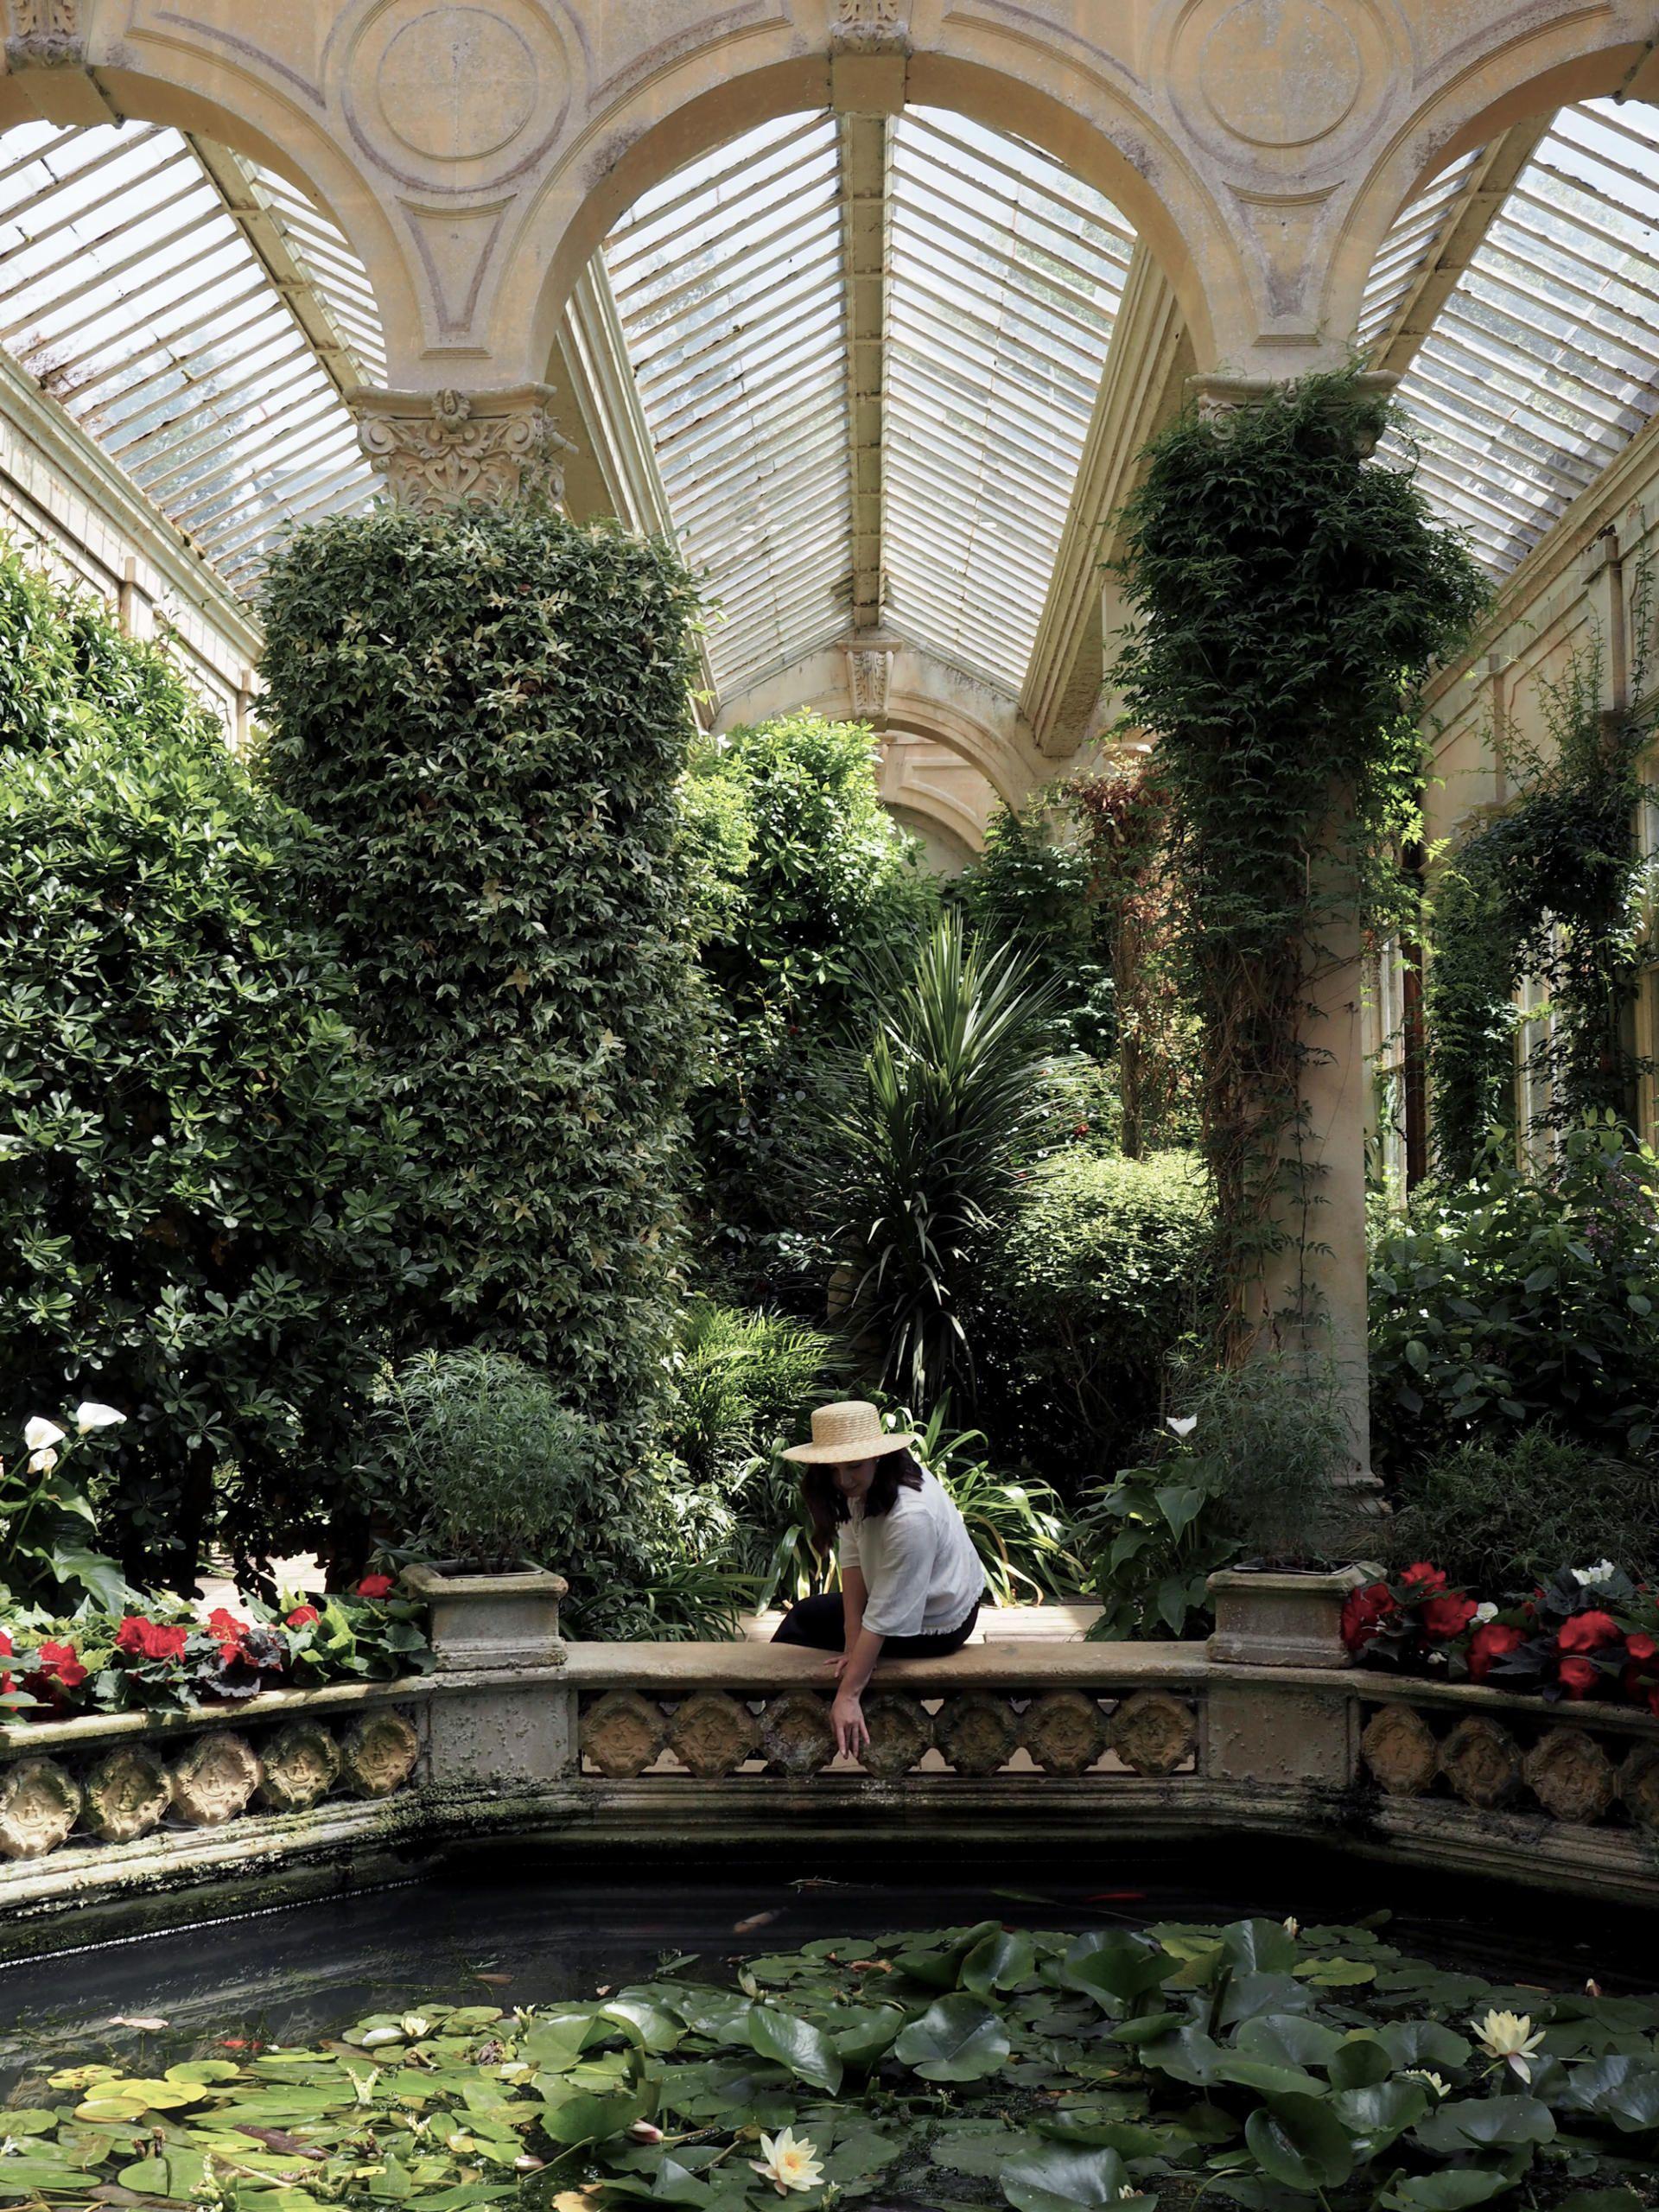 Castle Ashby Northamptonshire Botanical Gardens Garden 400 x 300